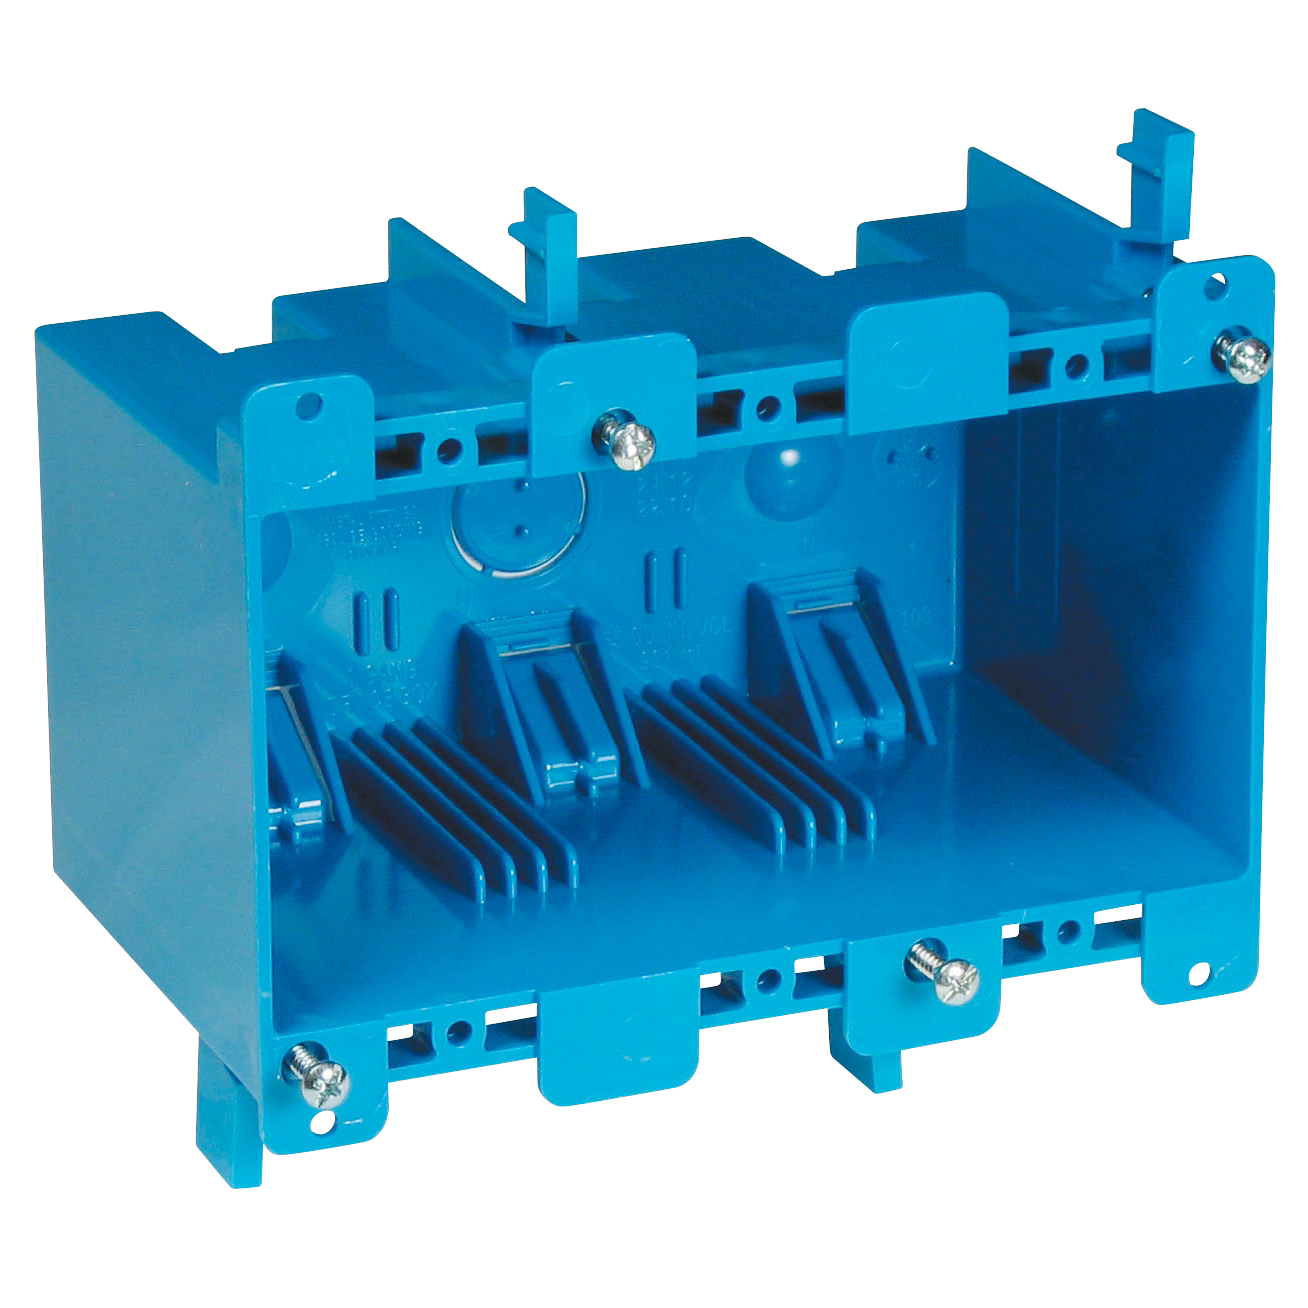 CARB355R CARLON B355R 3G SW BOX W/CLAMP;Carlon® B355R Non-Metallic Old Work Outlet Box, PVC, 55 cu-in Capacity, 3 Gangs